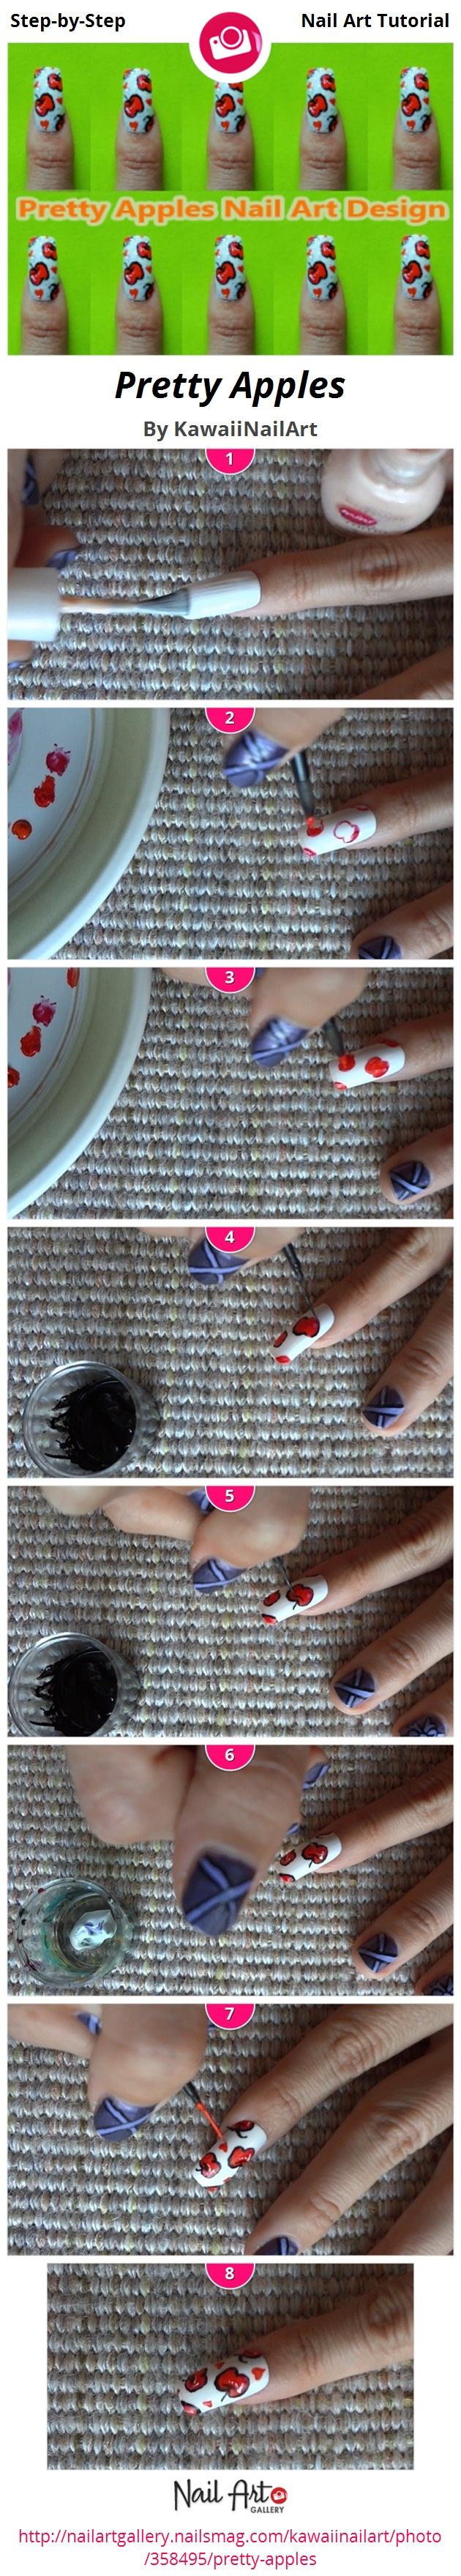 Pretty Apples Nail Art Design - Nail Art Gallery